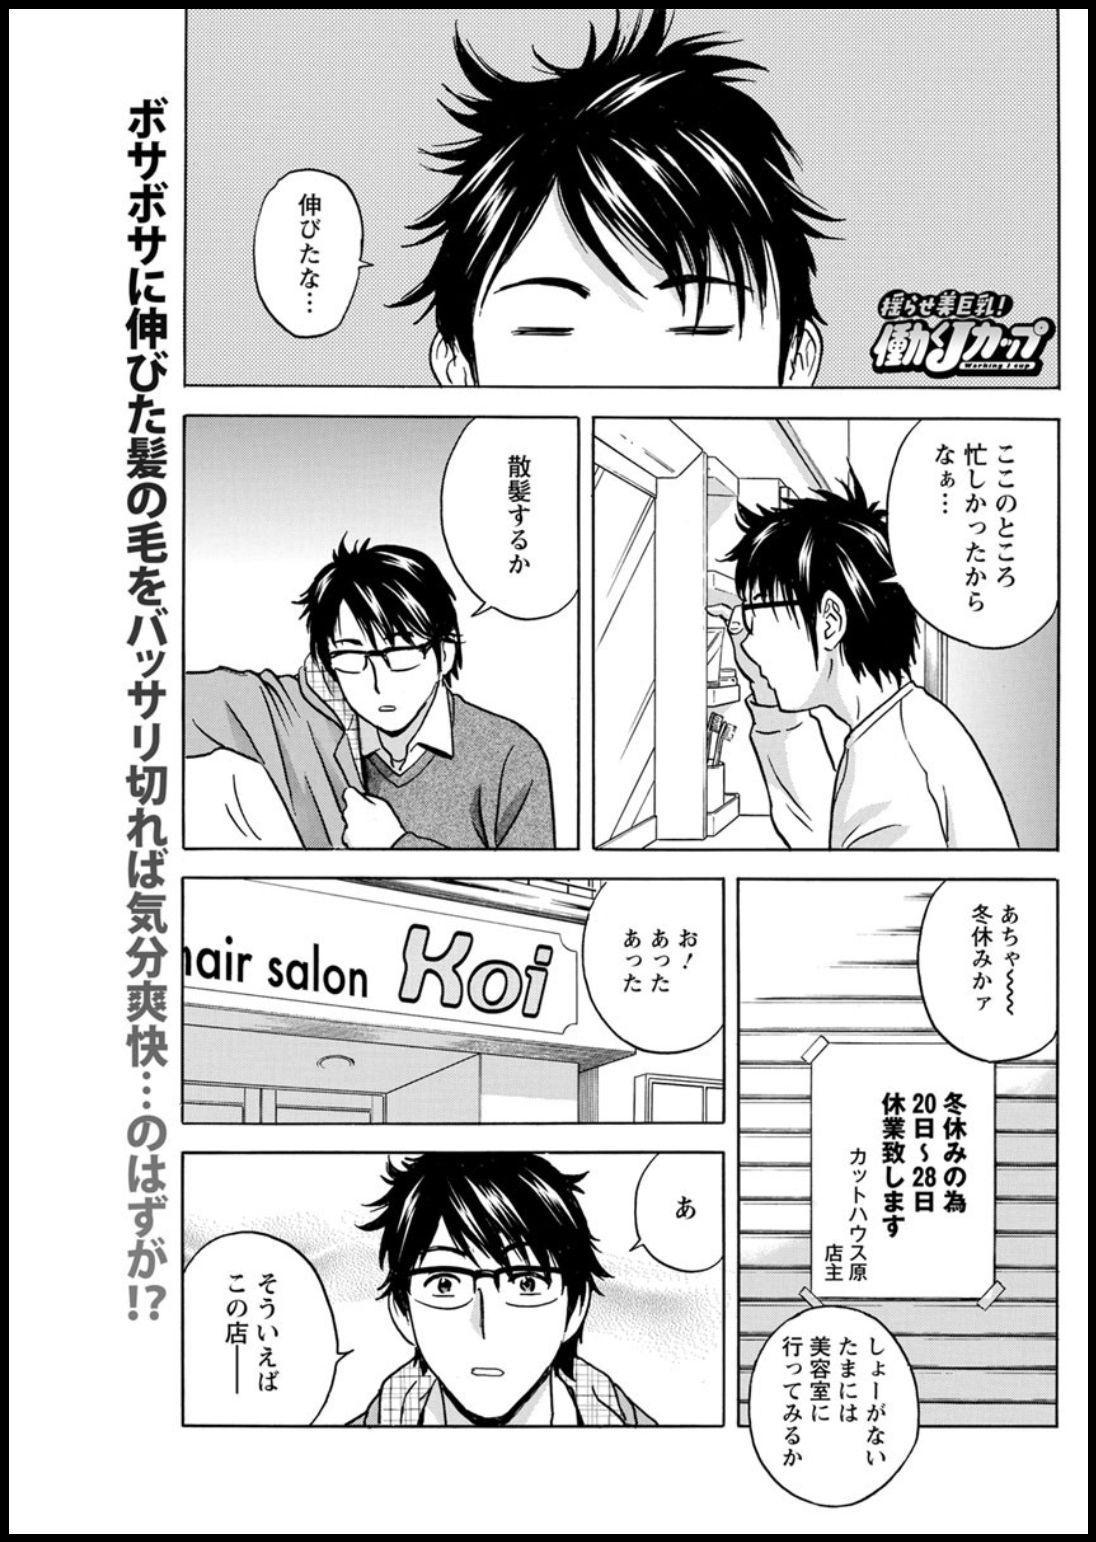 [Hidemaru] Yurase Bikyonyuu! Hataraku J-Cup Ch. 1-5 [Digital] 74